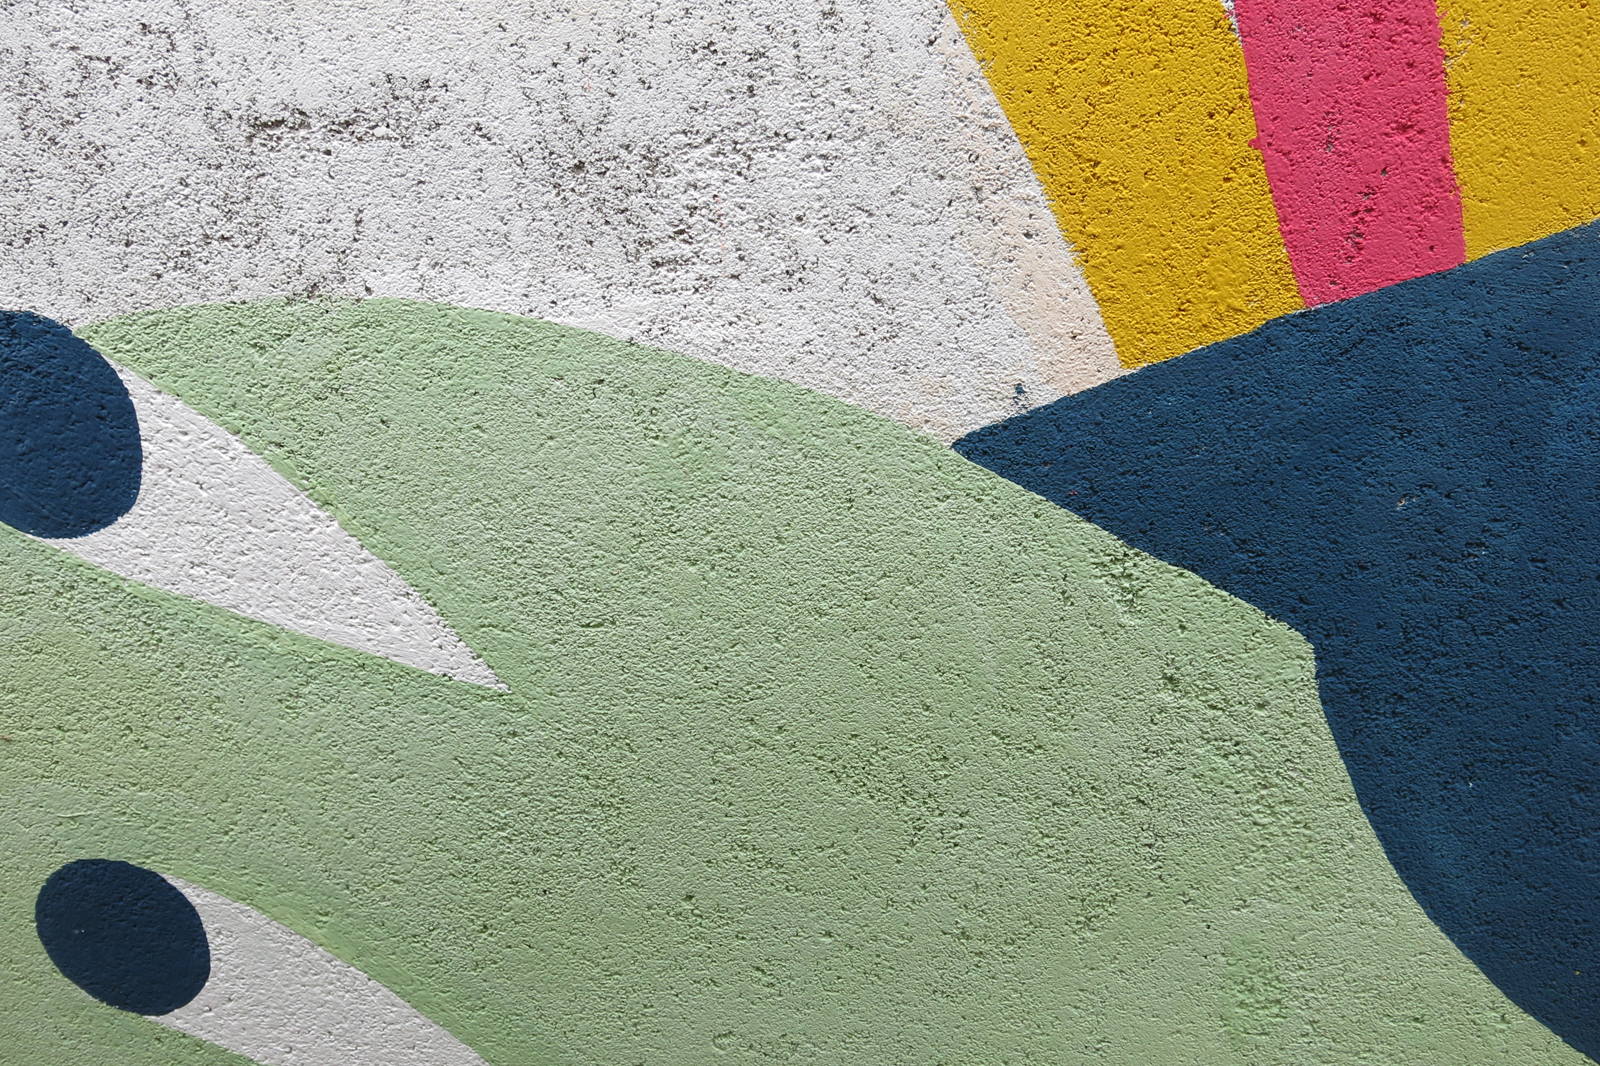 turbosafary-o-favola-sullasilo-new-mural-at-serendipita-06